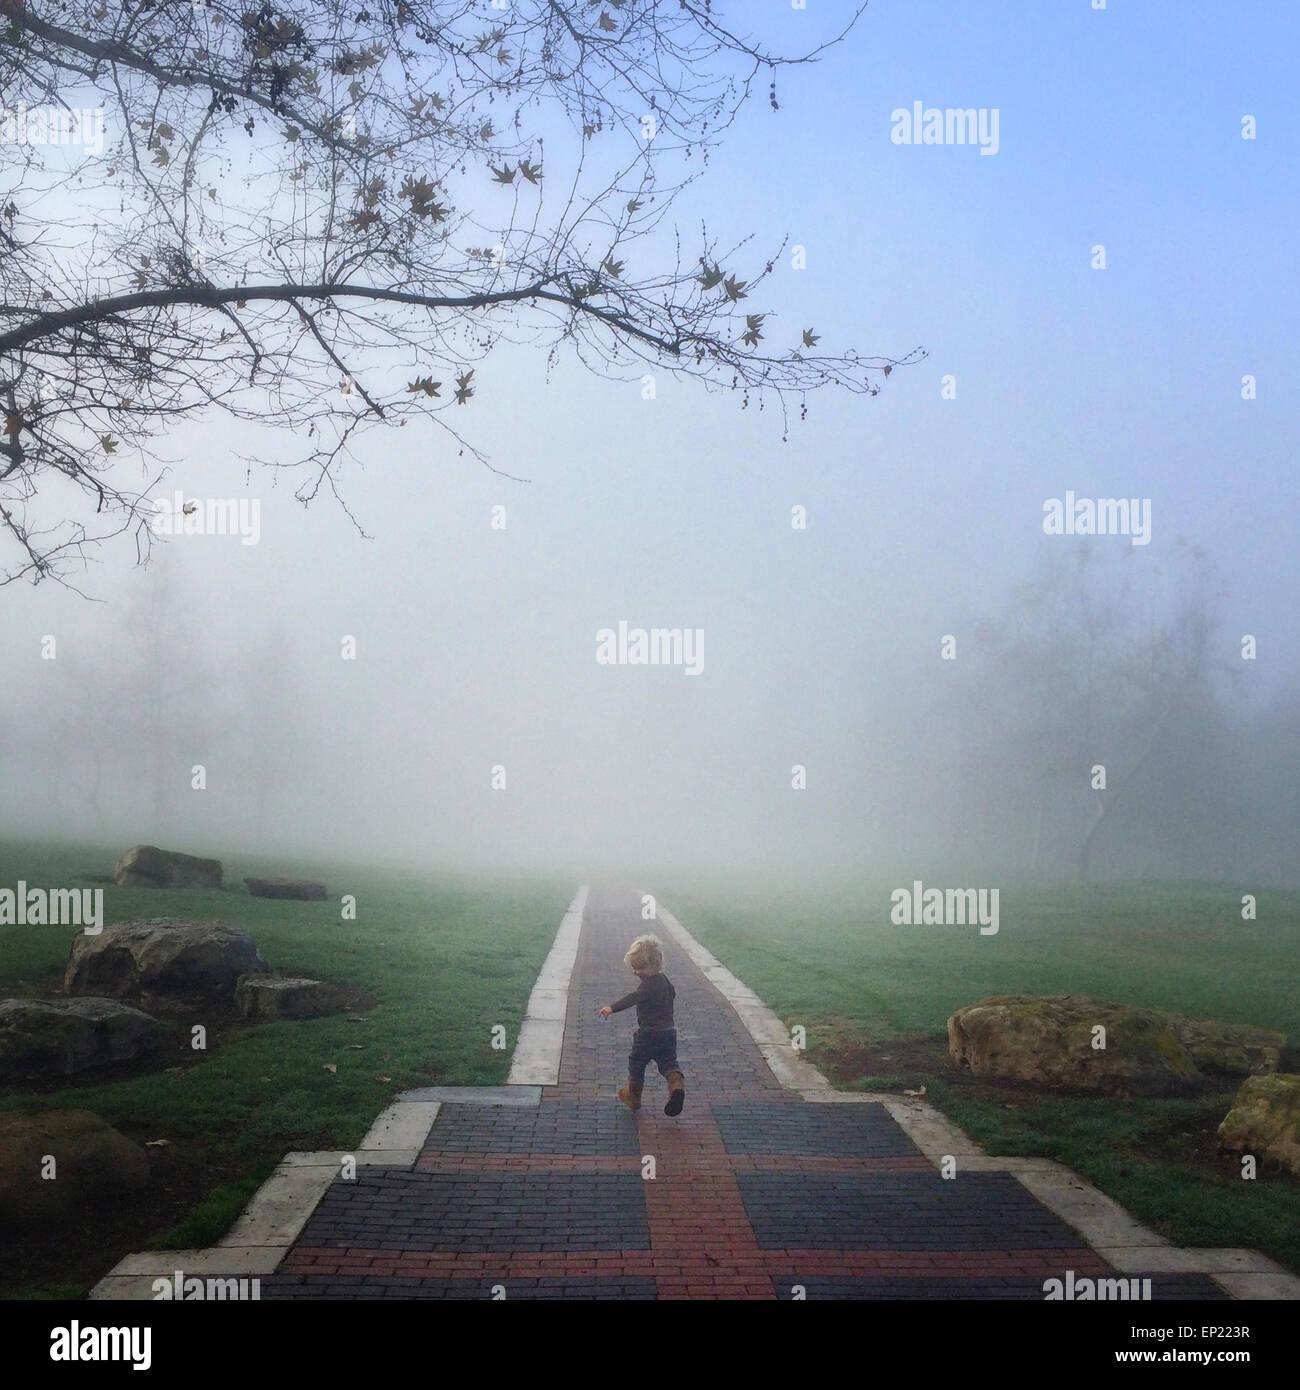 Boy running down path laughing - Stock Image